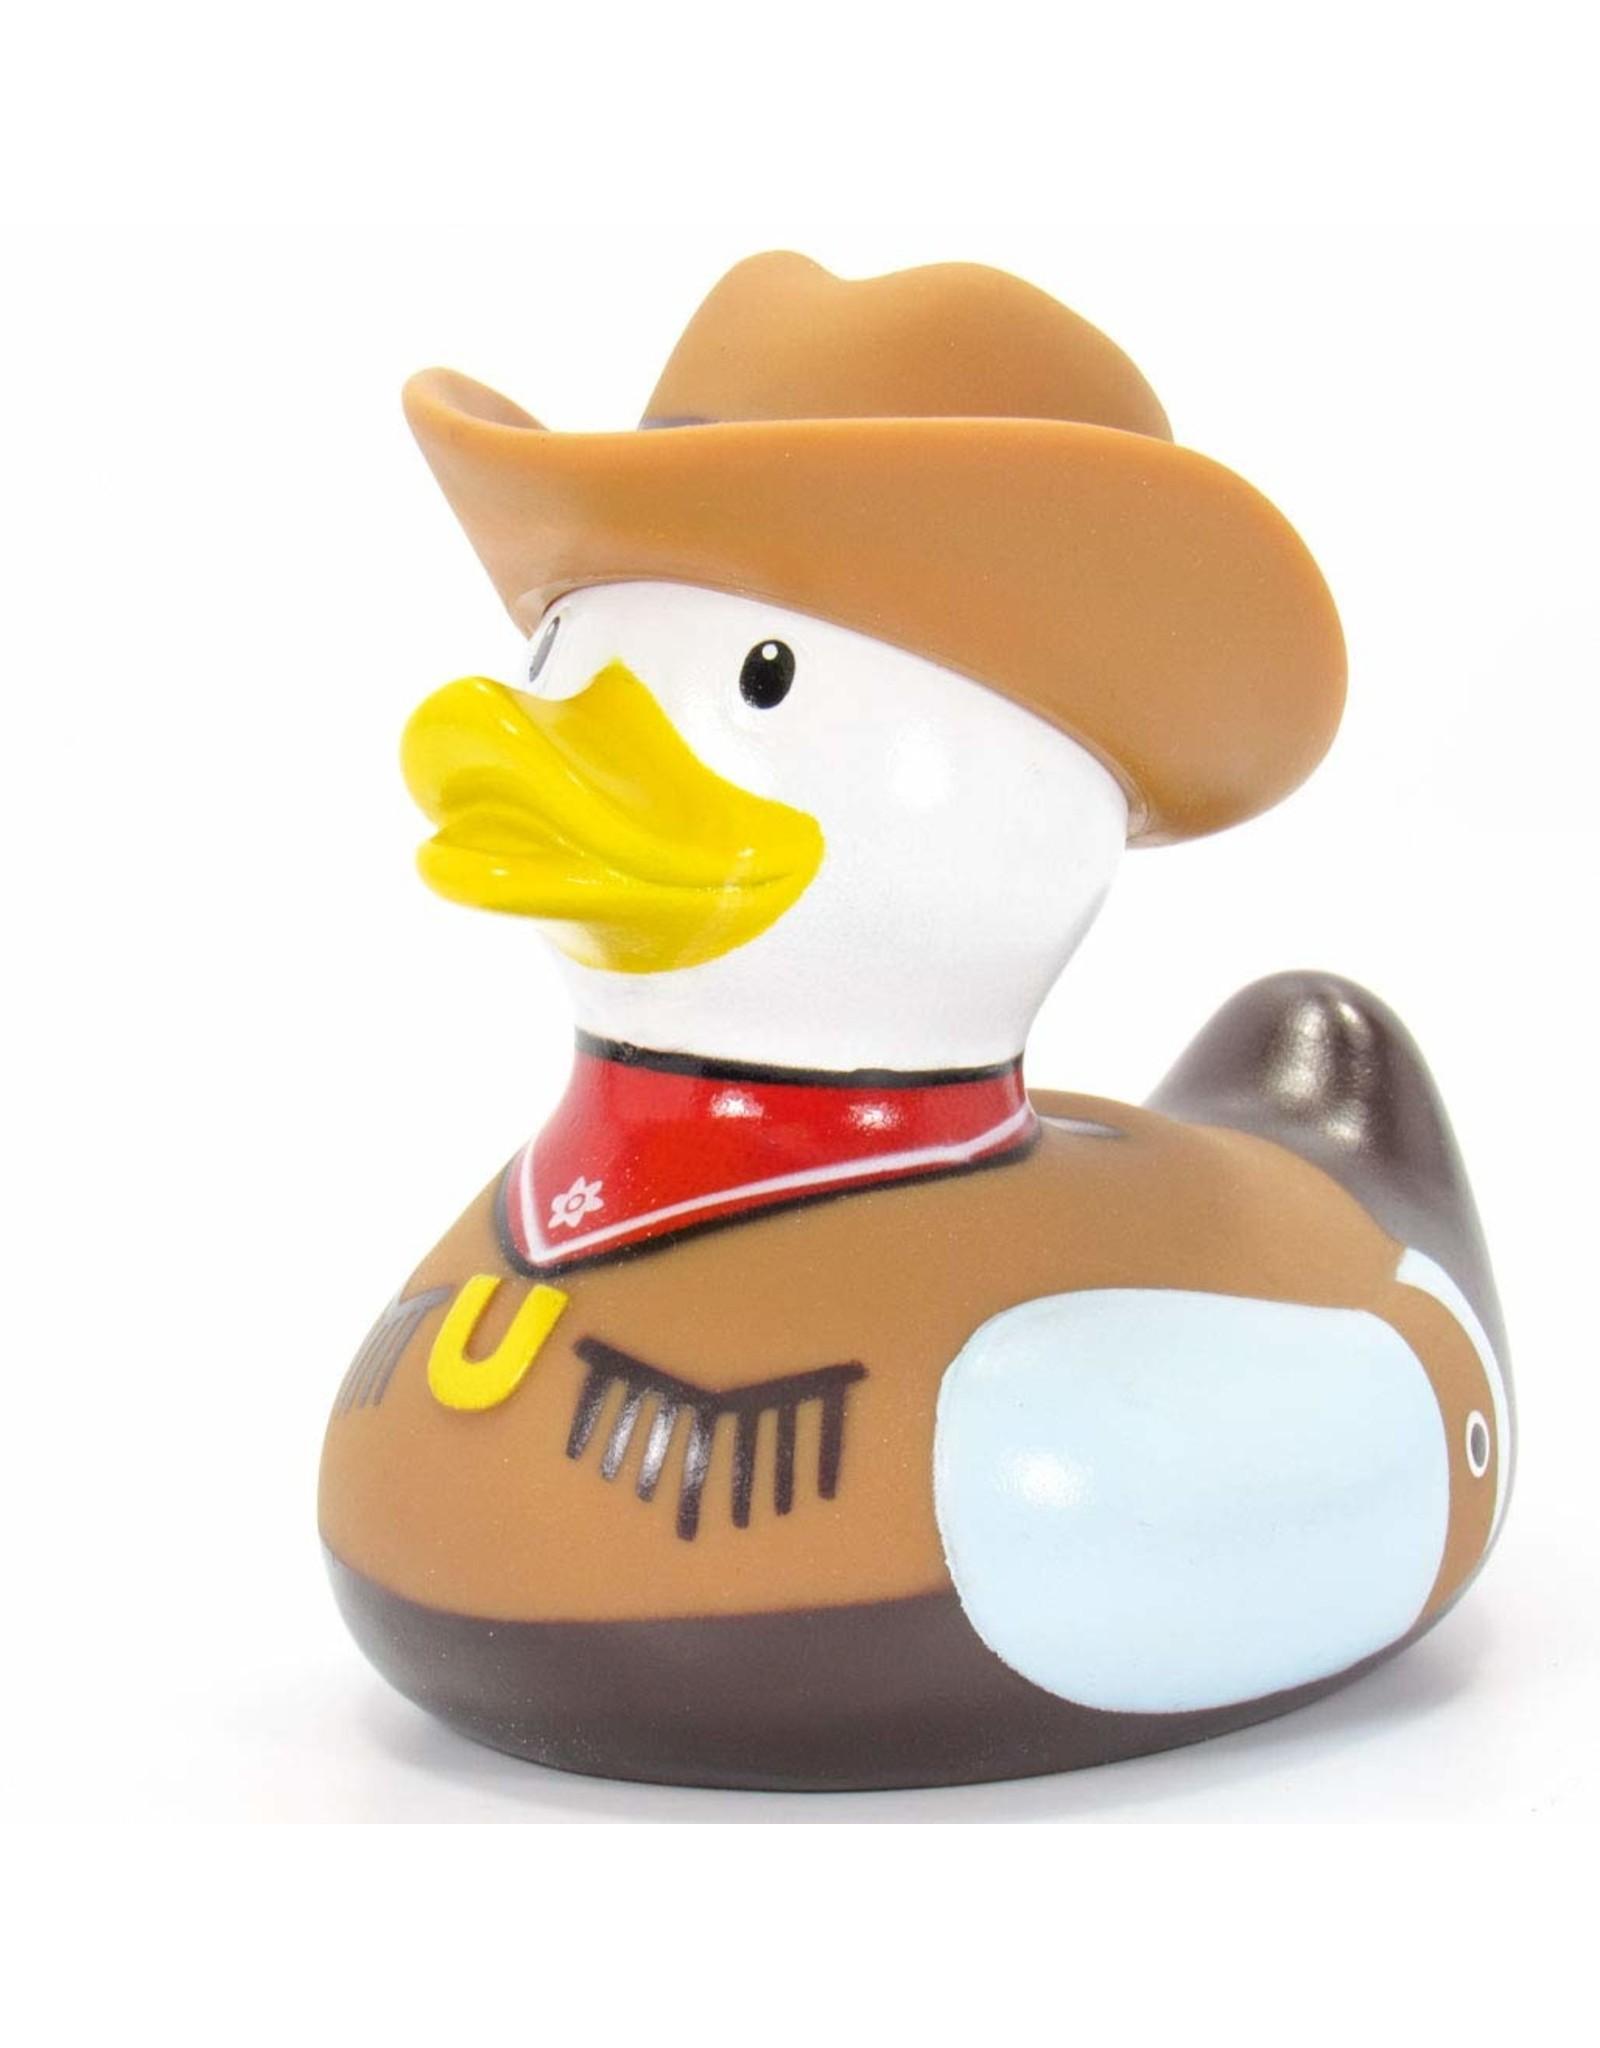 Cowboy Rubber Duck